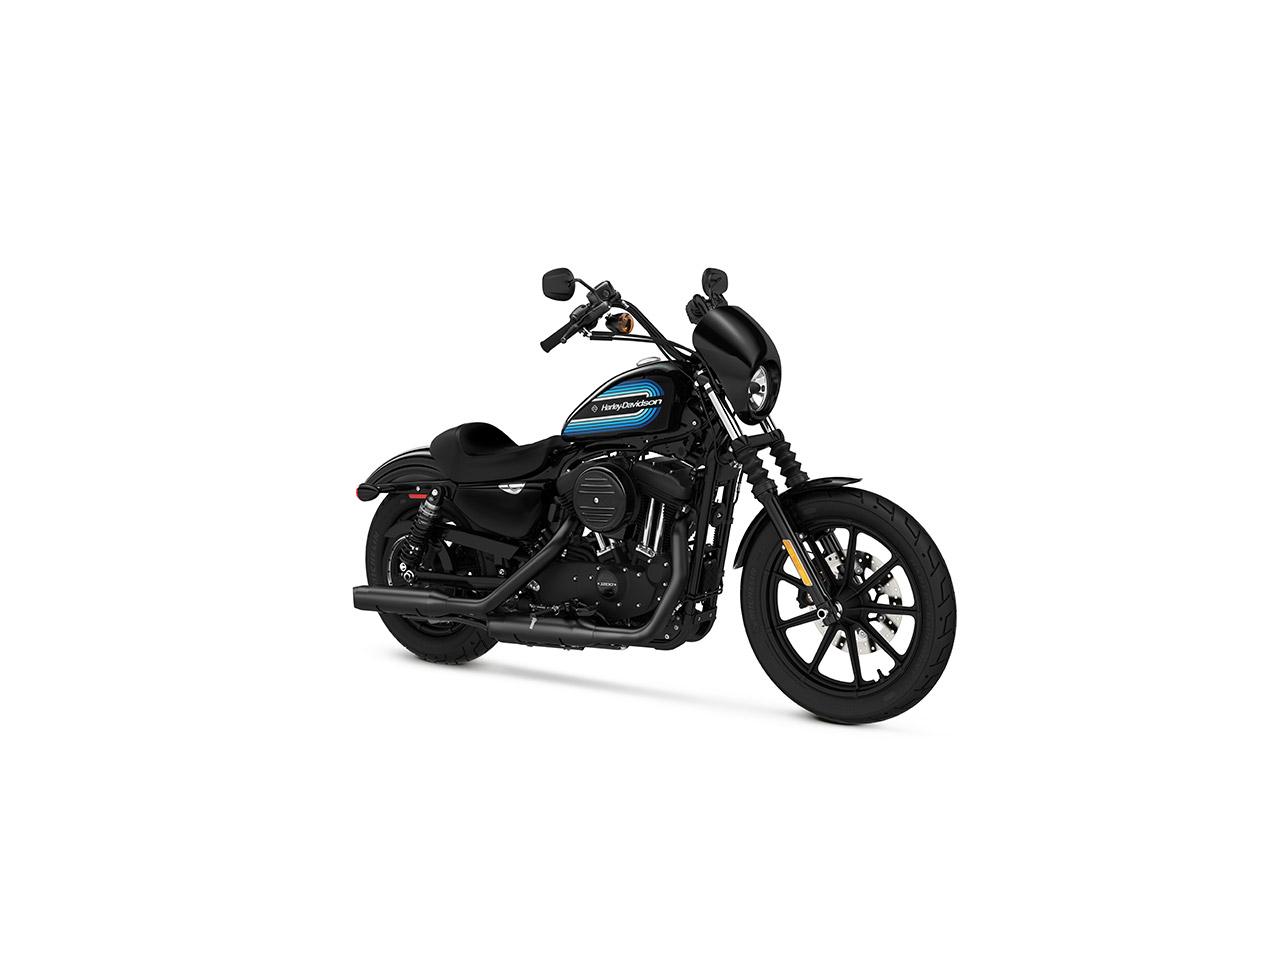 2018 Harley-Davidson Sportster Iron 1200 Image